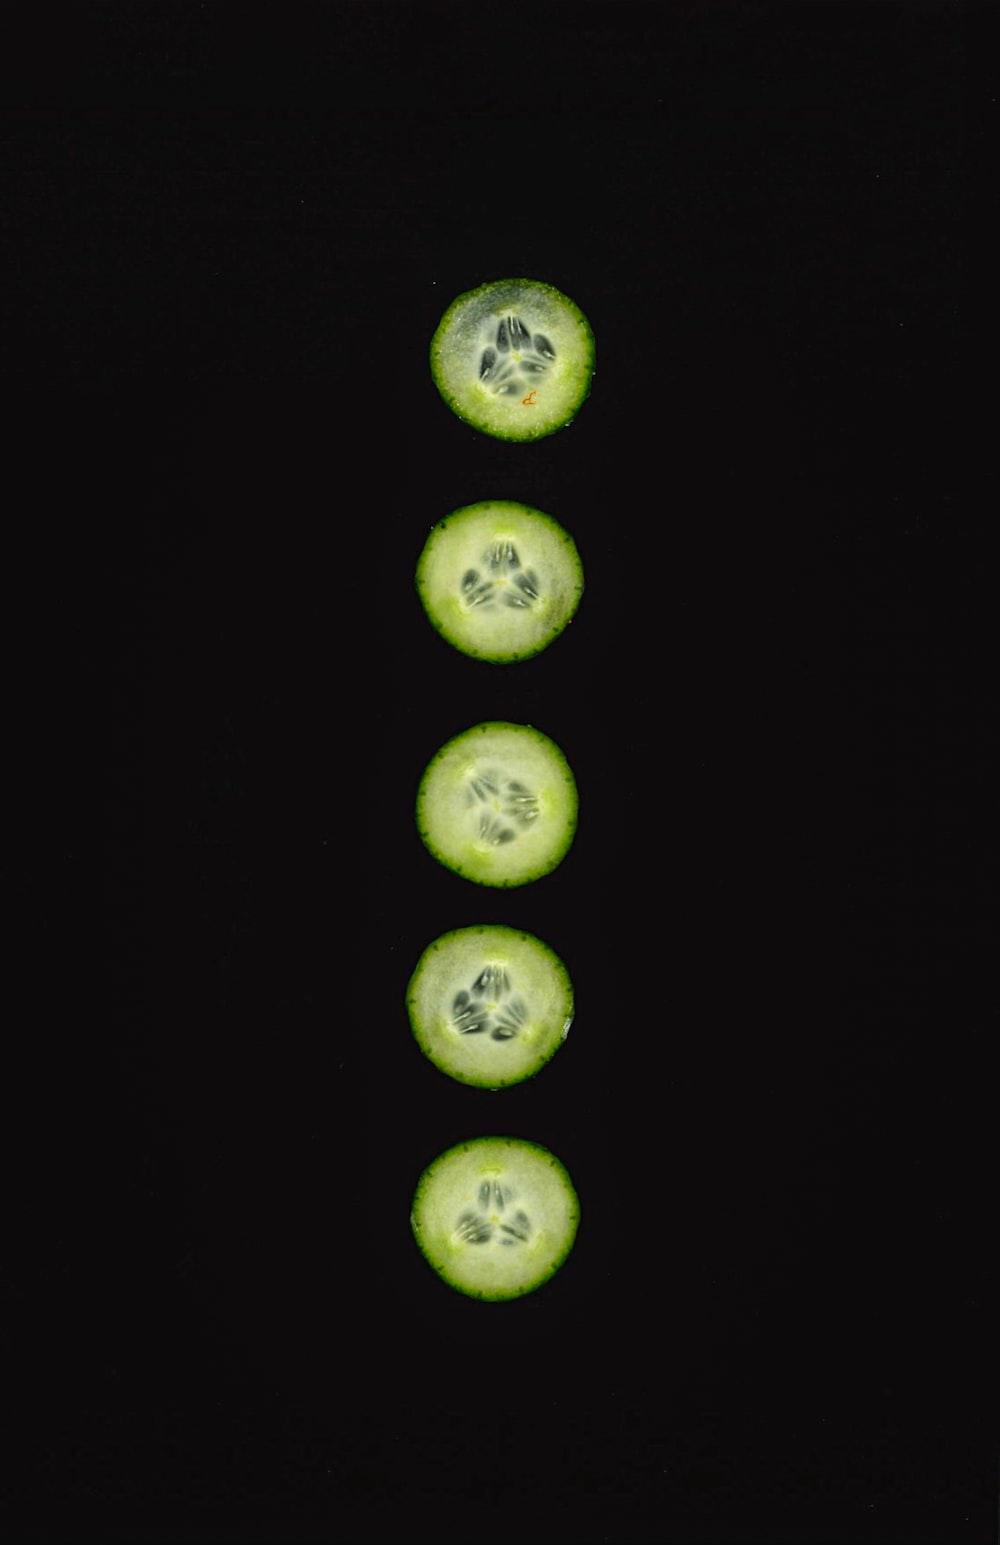 3 sliced green citrus fruits